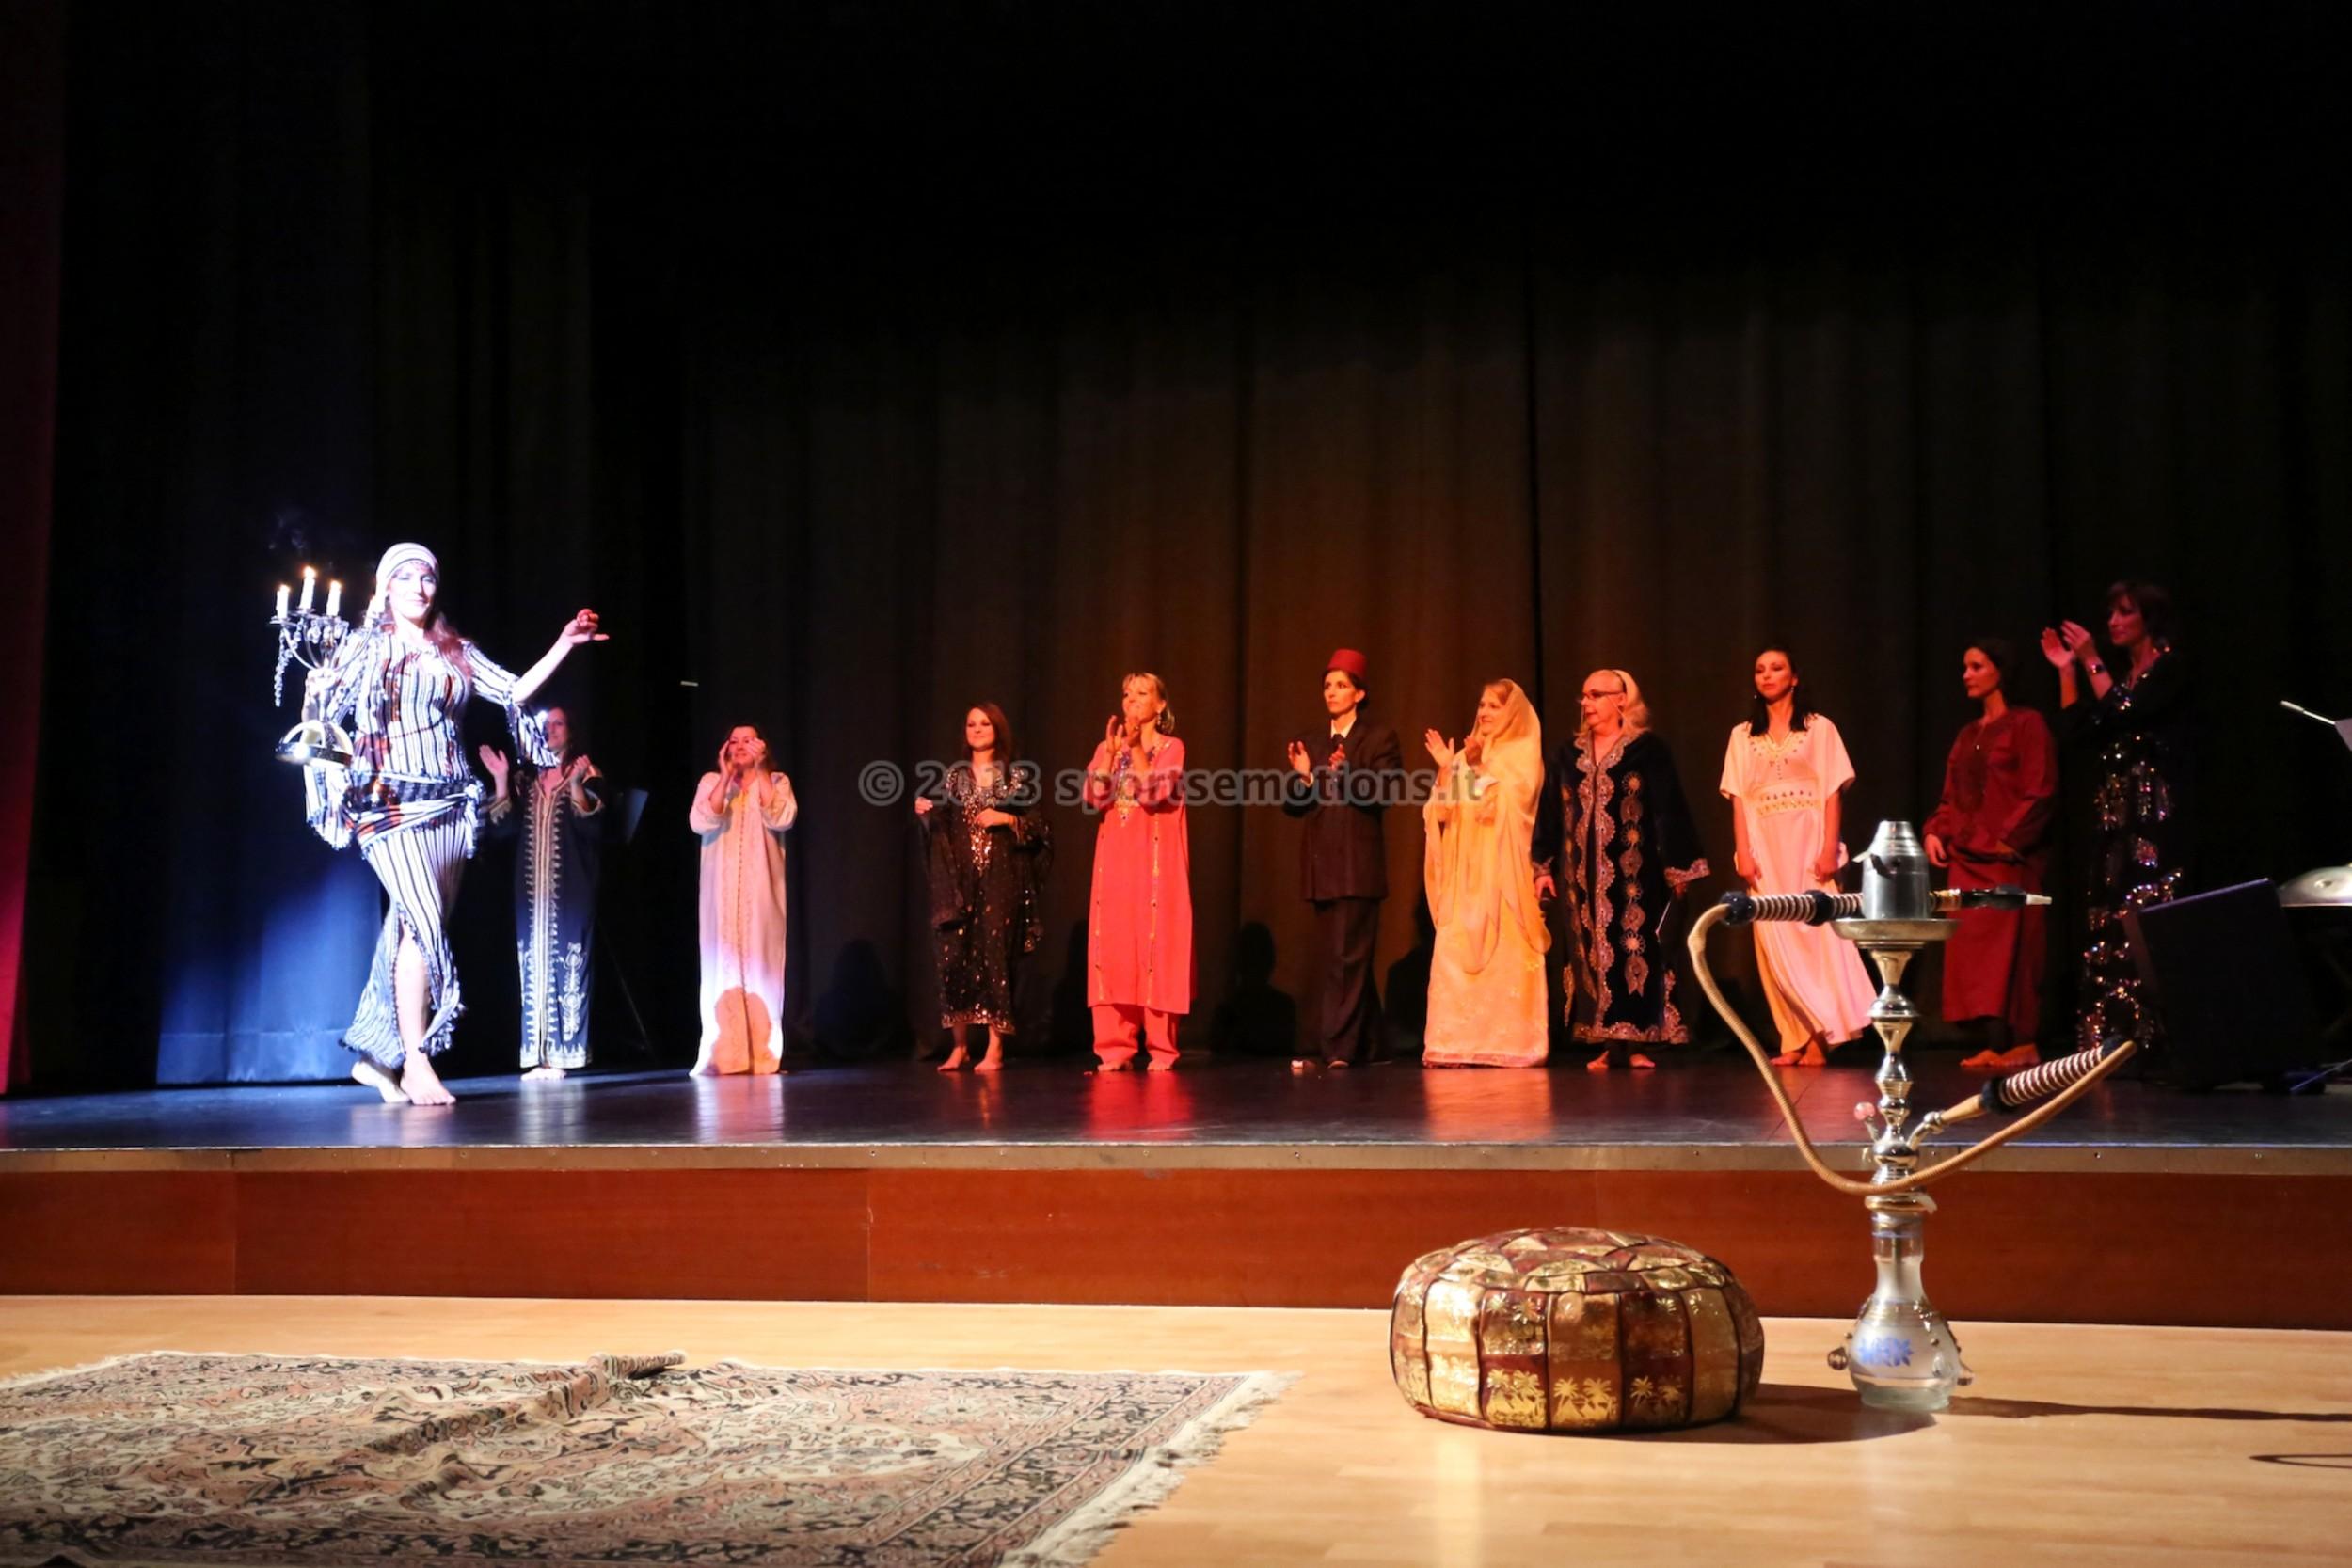 Zaffa bei der Show Kaleidoskop in Sterzing